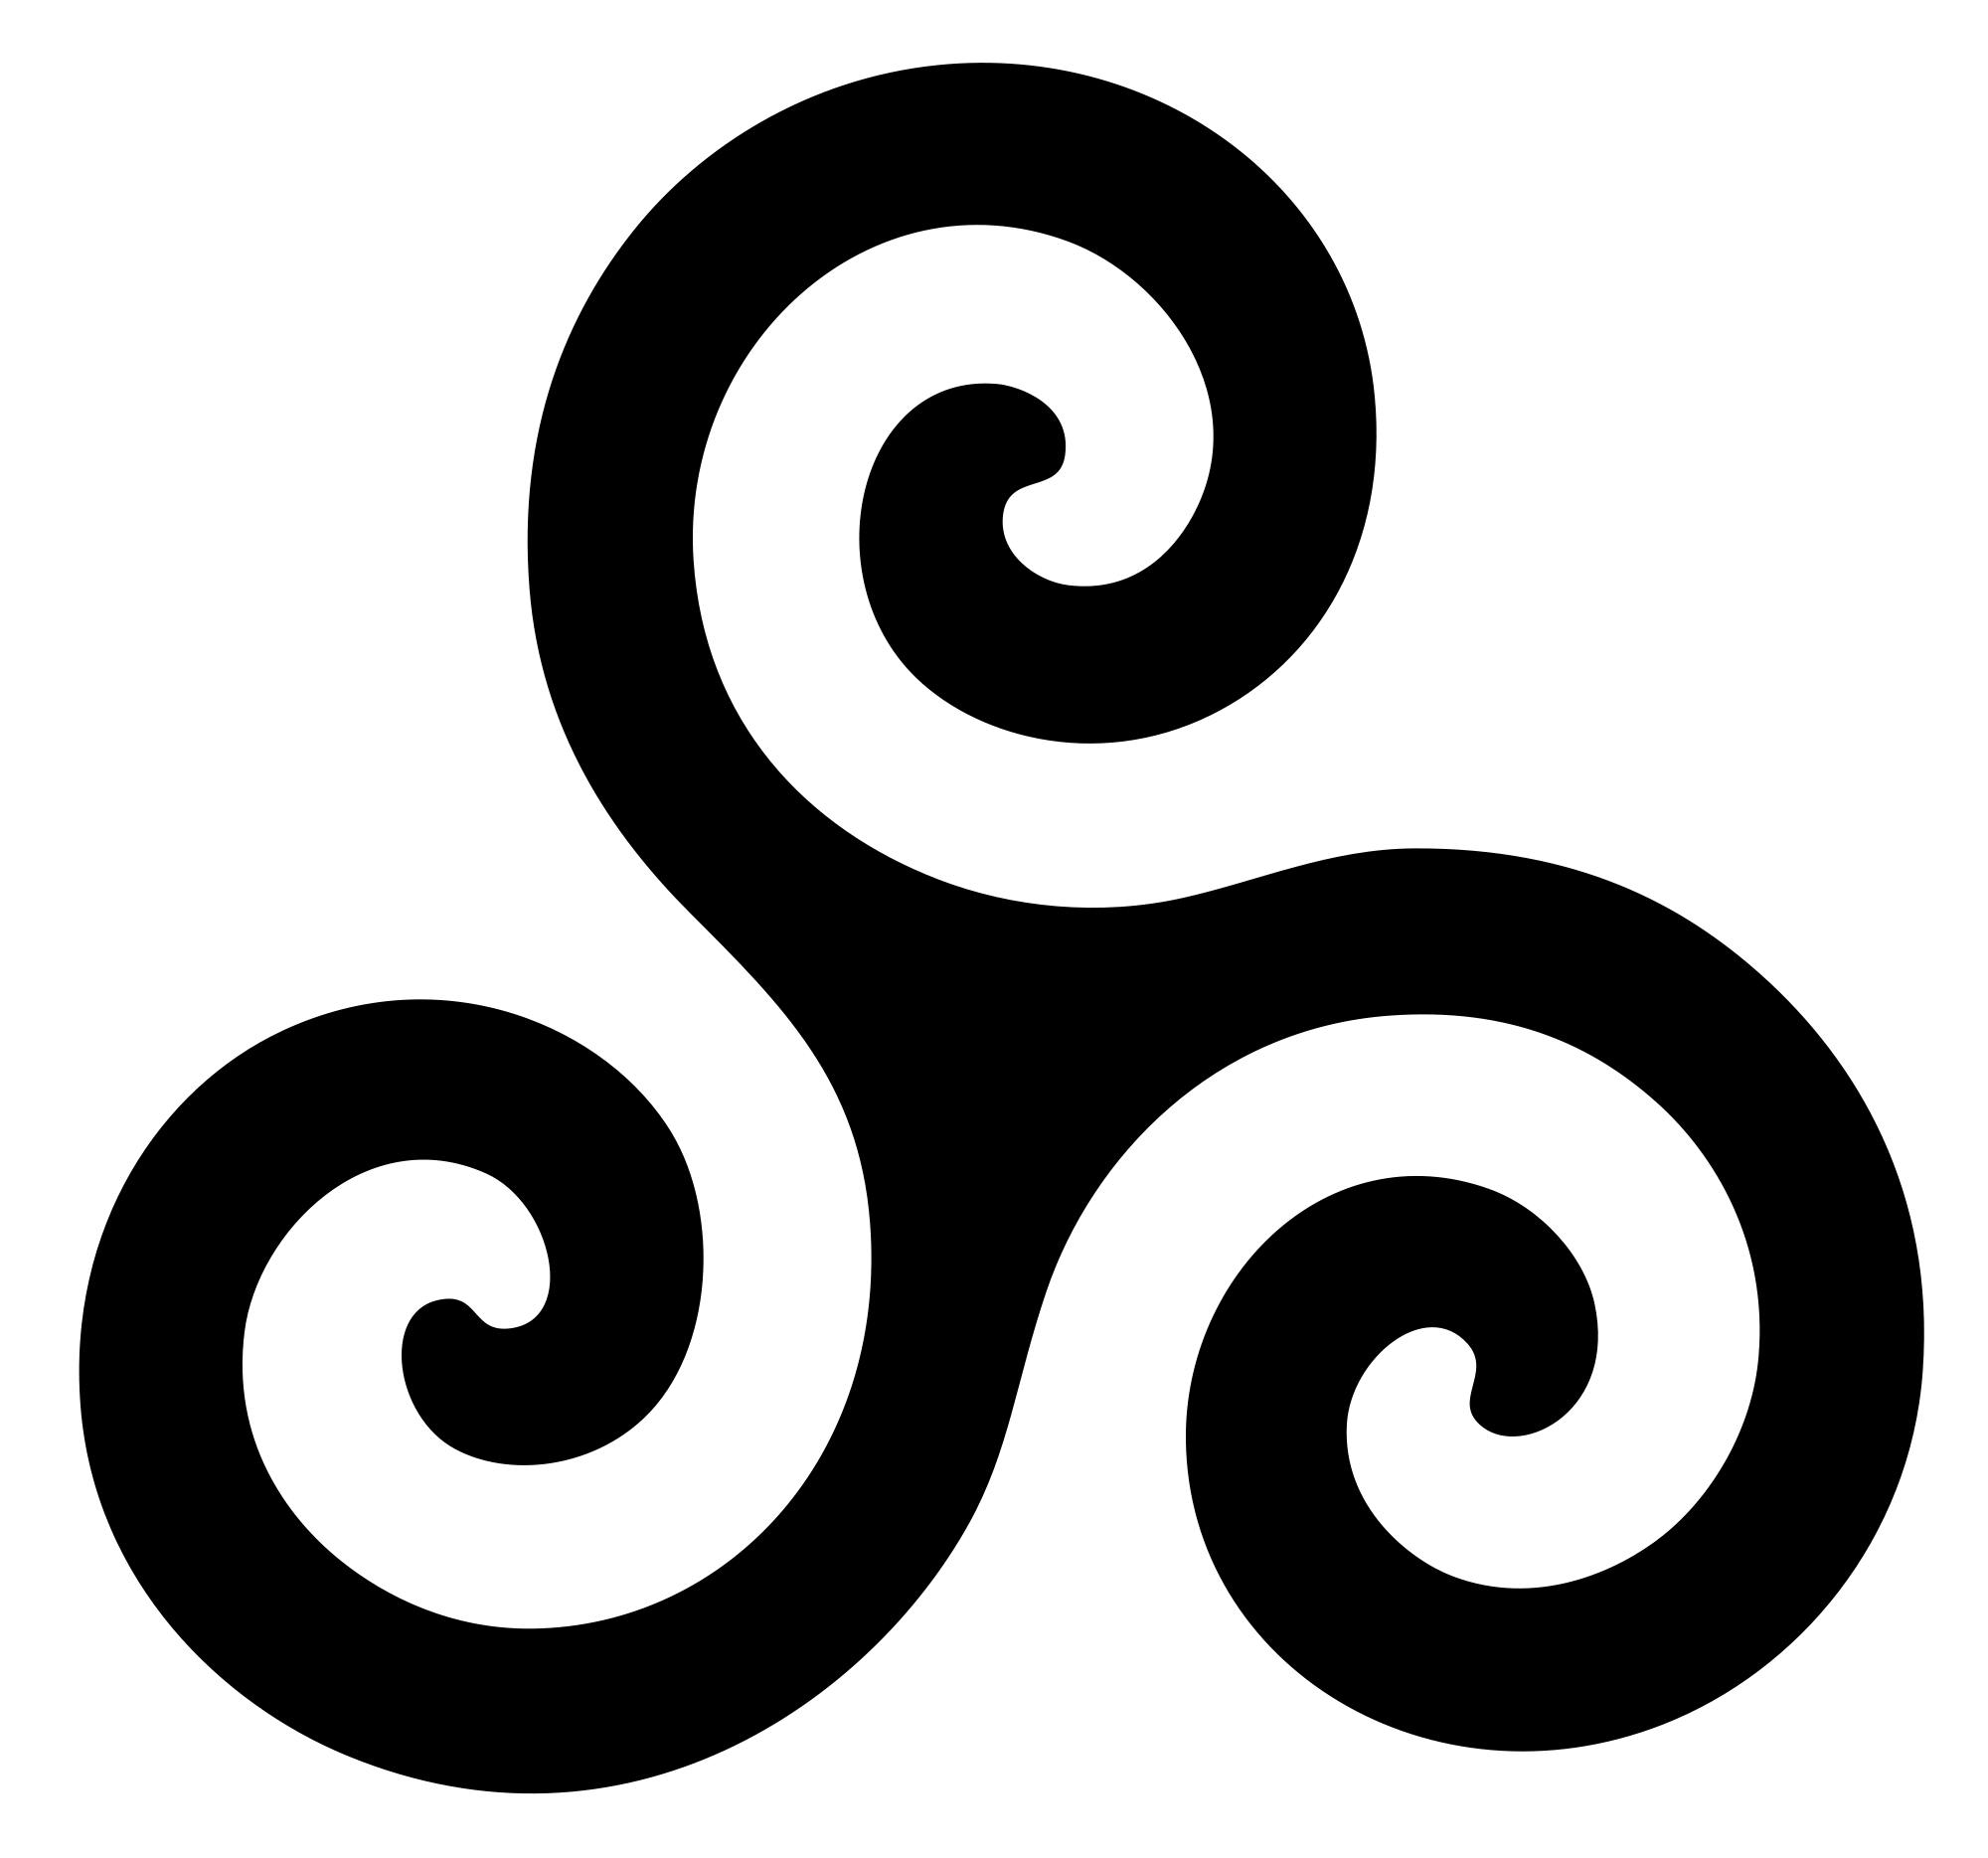 Future clipart journey life. File triskele symbol svg